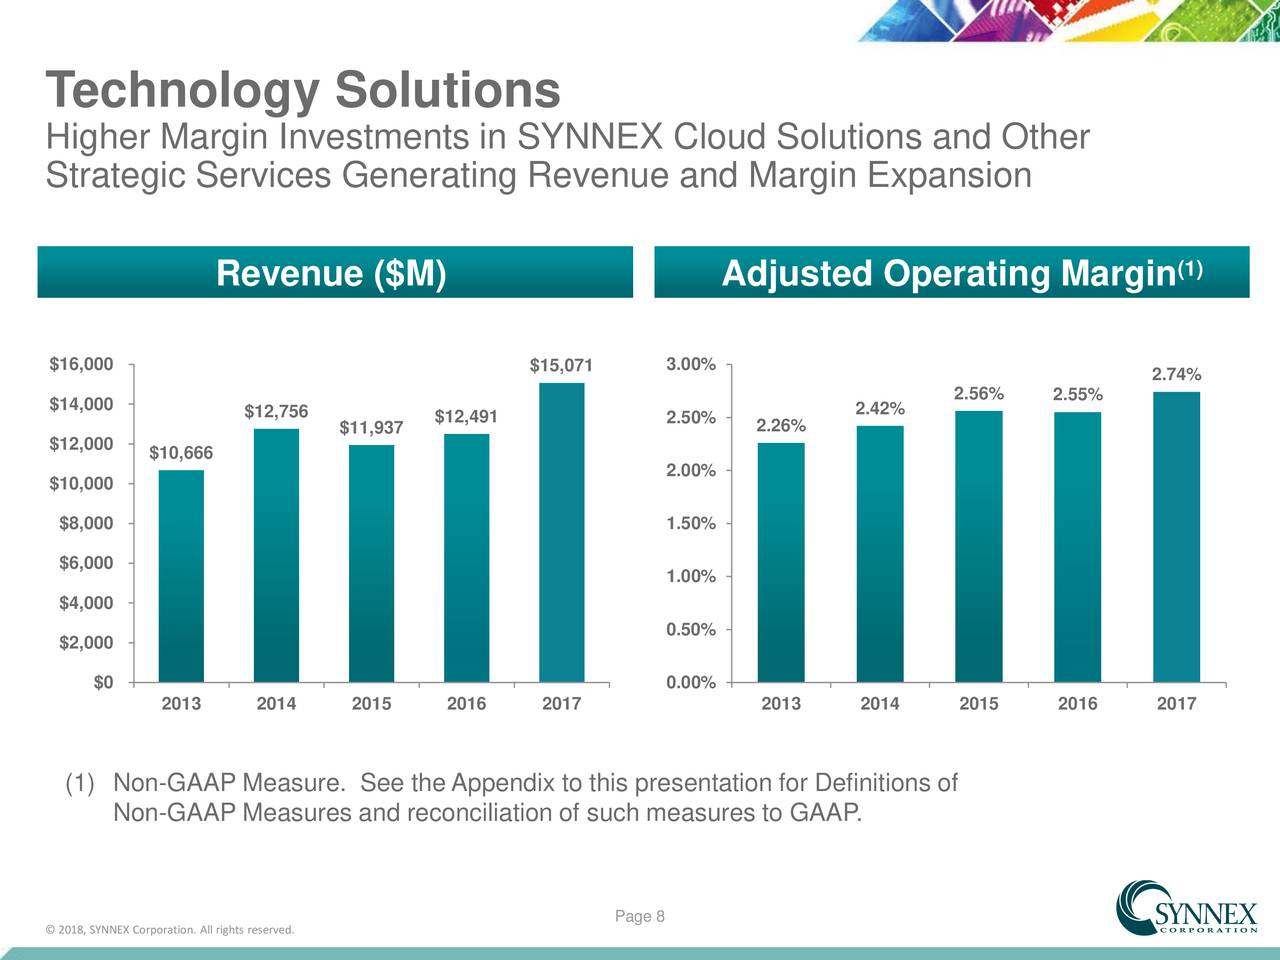 revenue generation measures